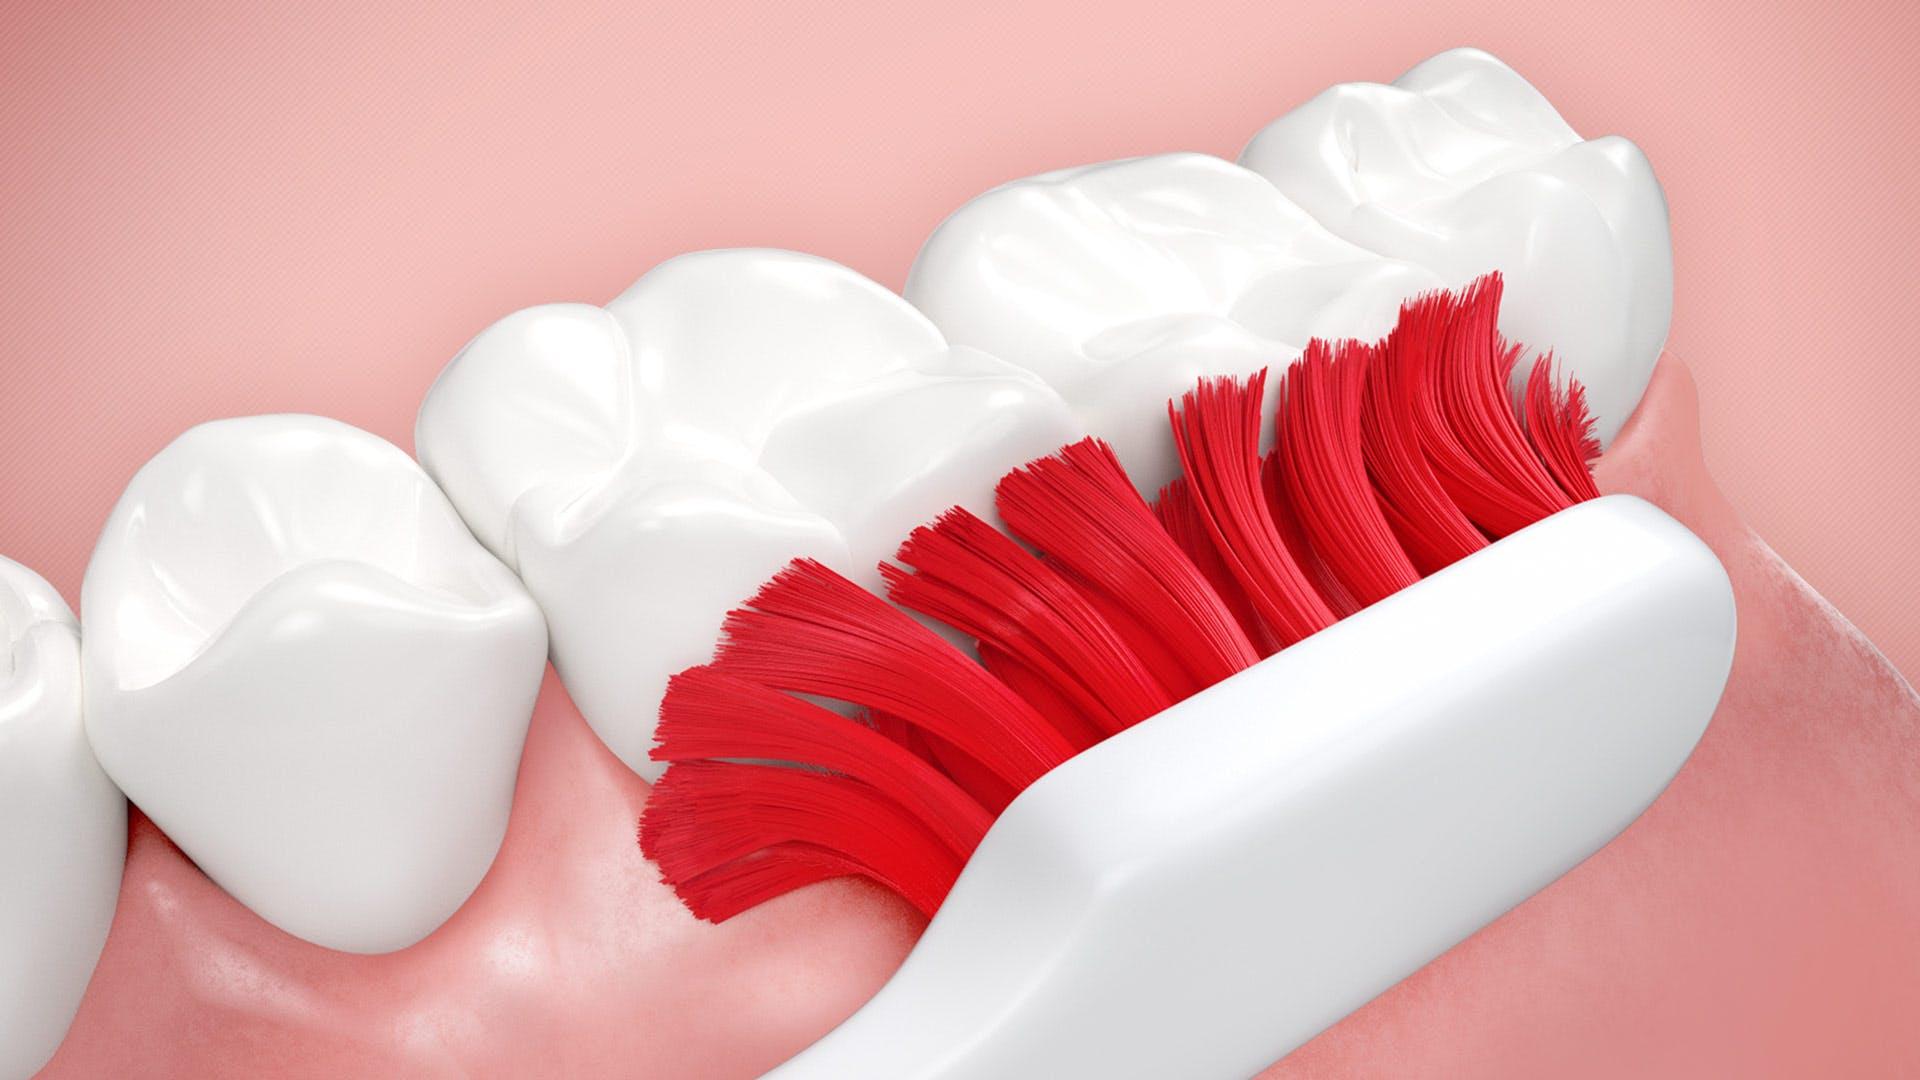 Зъболекар, лекуващ пациент